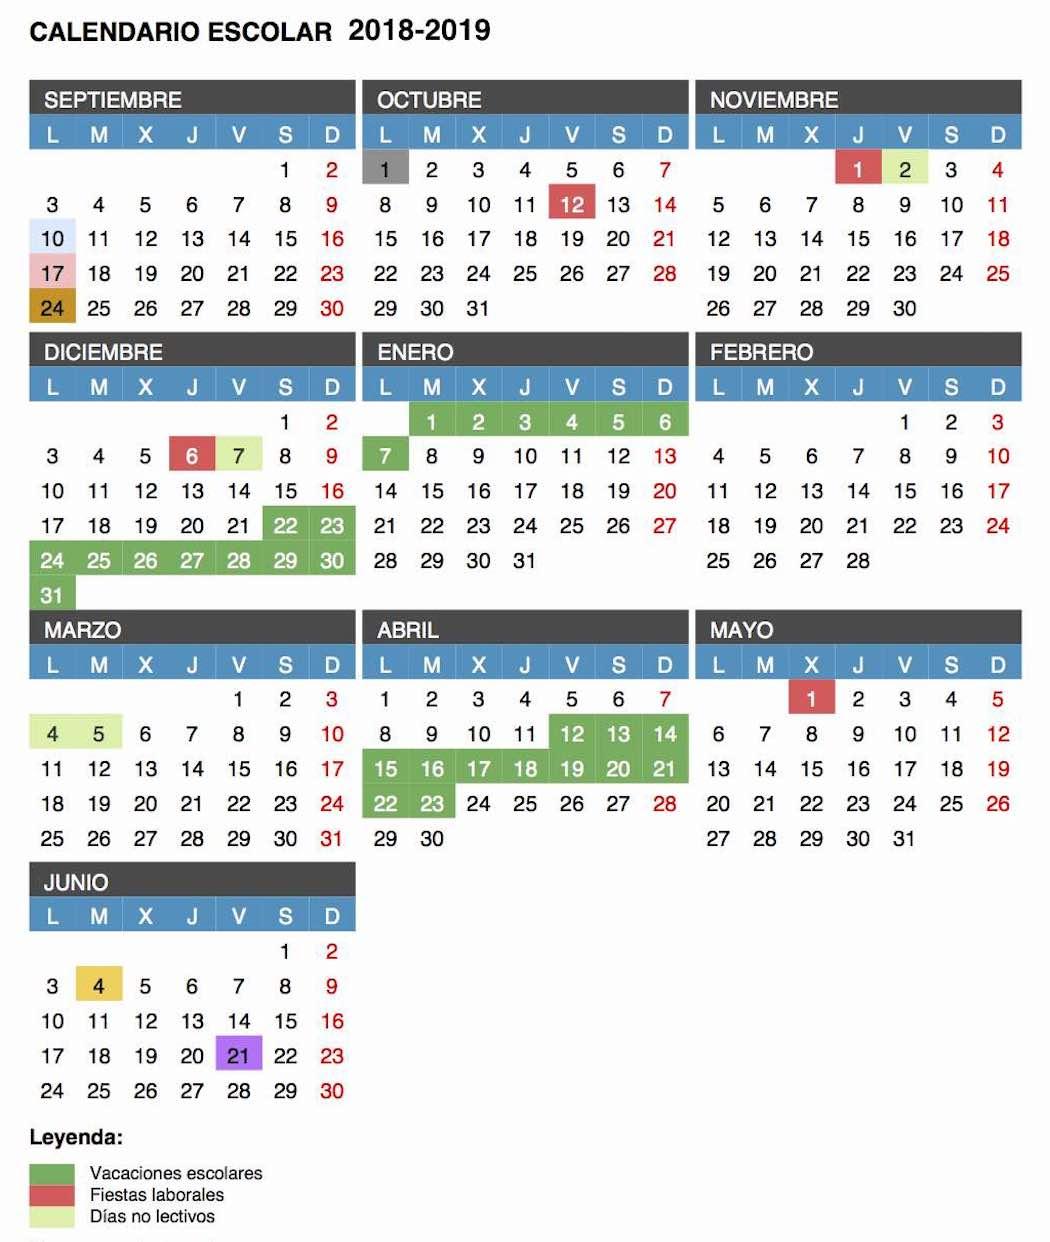 Calendario Vacaciones.Calendario Escolar